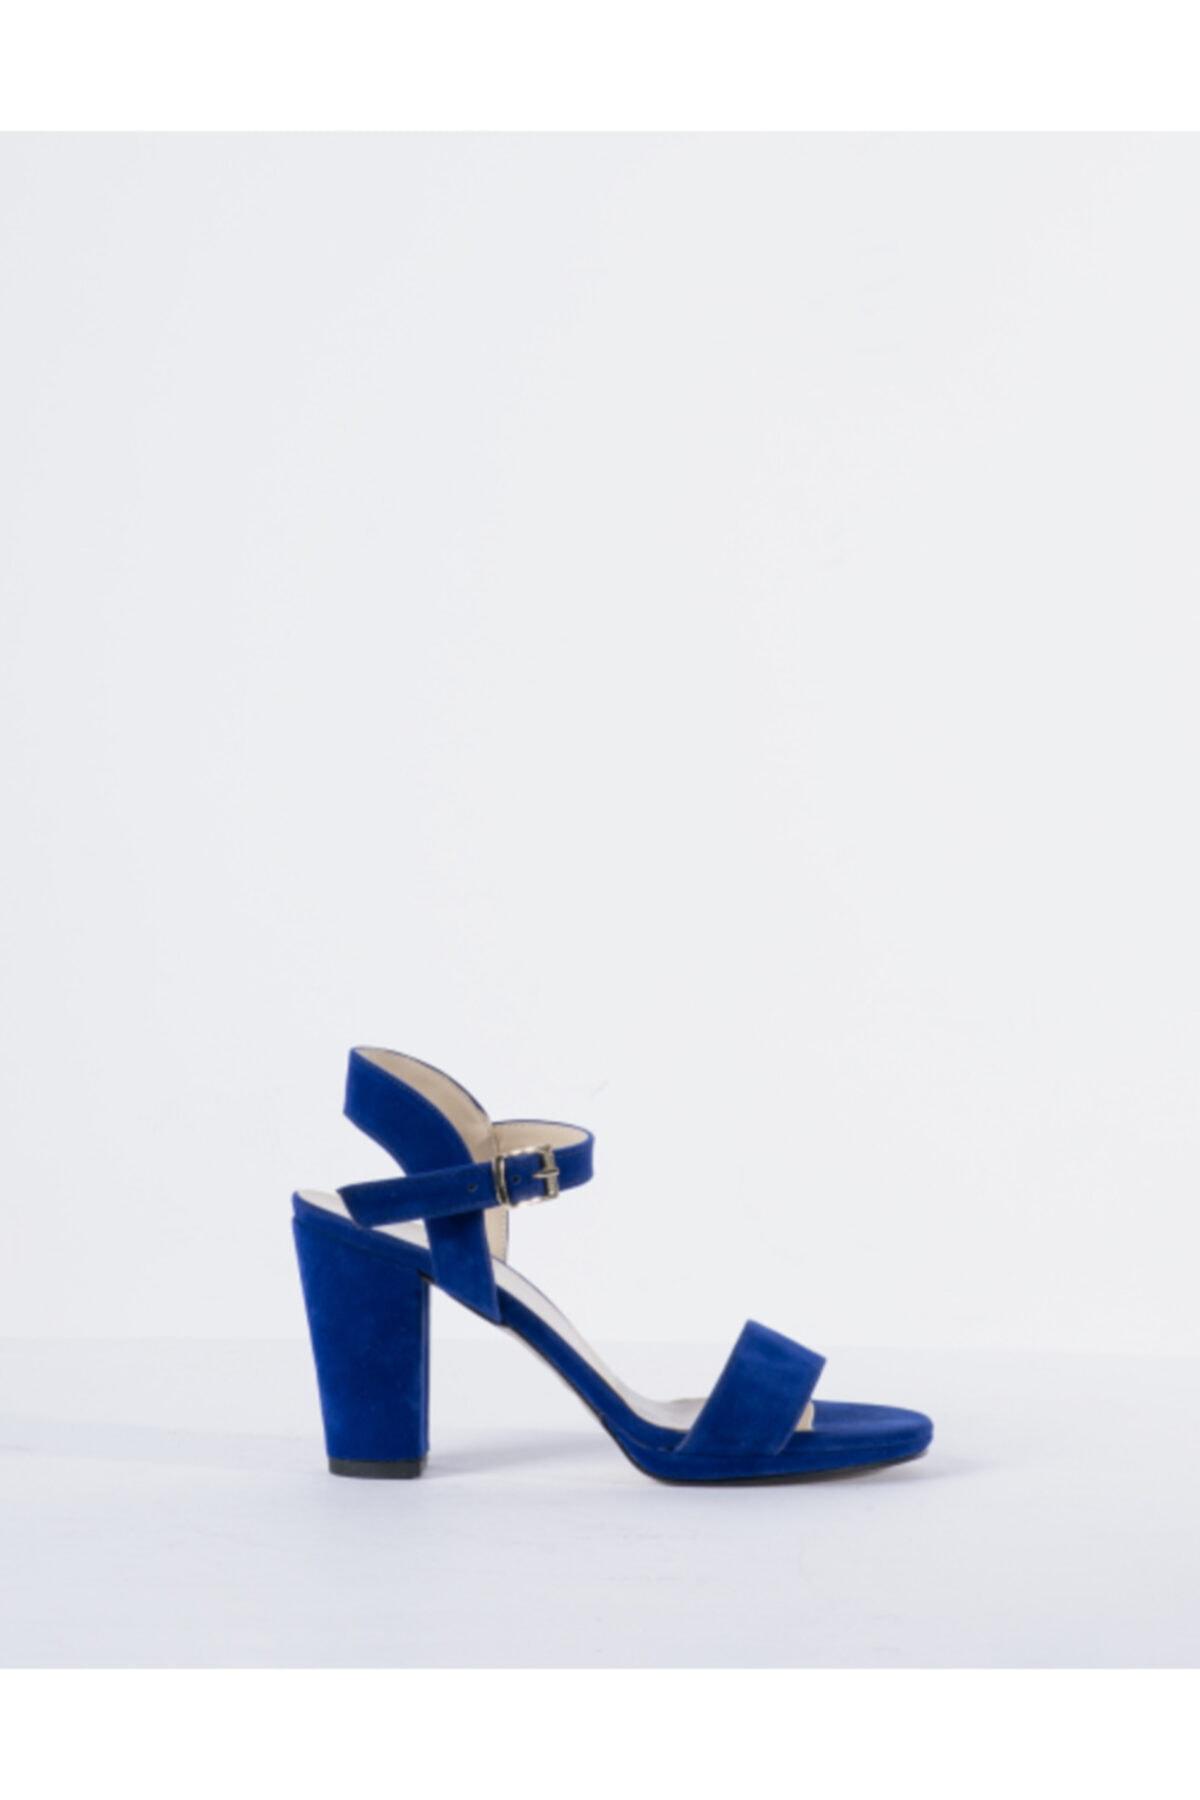 Vision Kadın LacivertTopuklu Ayakkabı 1